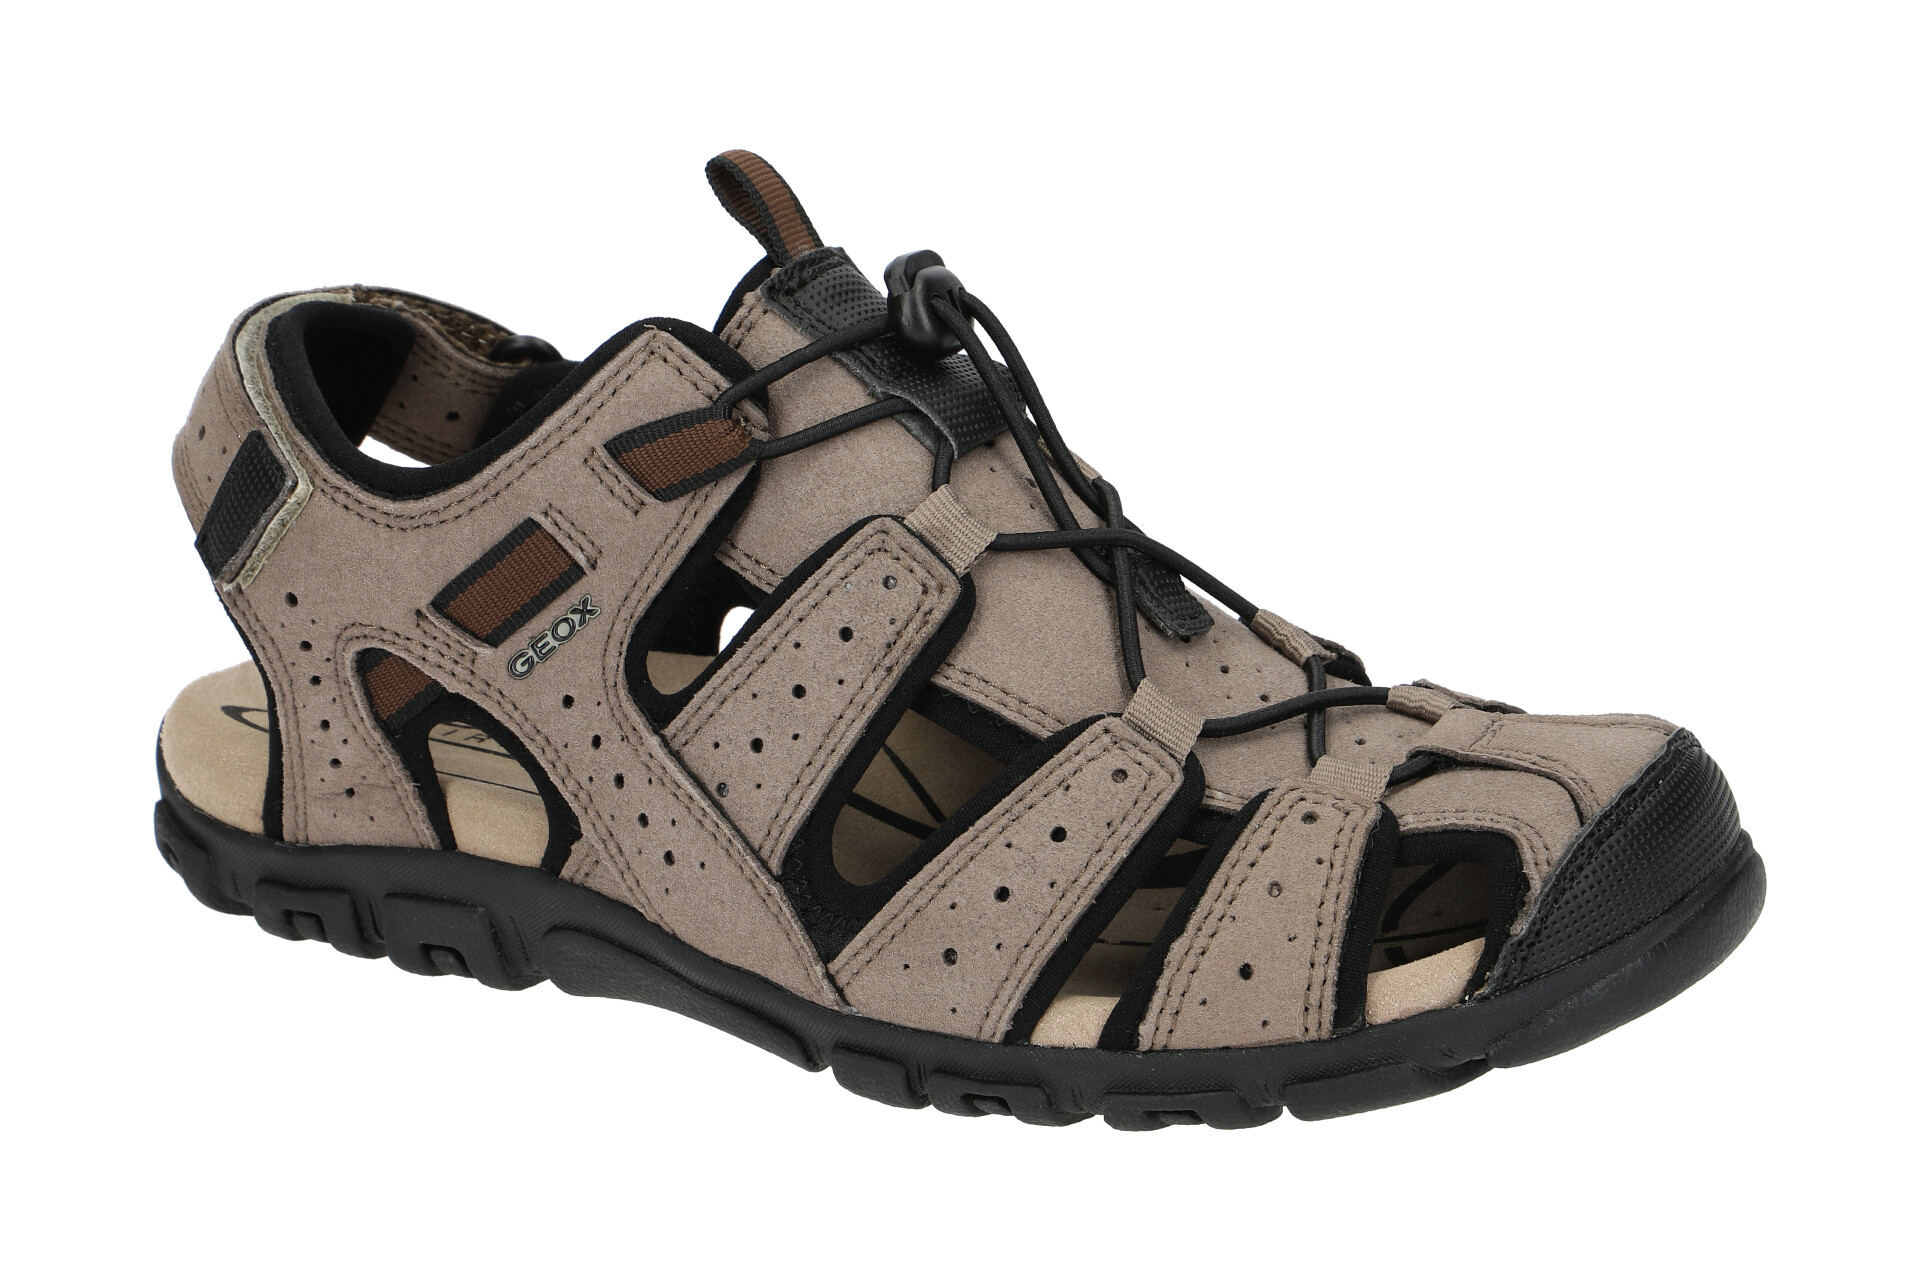 Geox Strada Outdoor Sandale grau U6224B